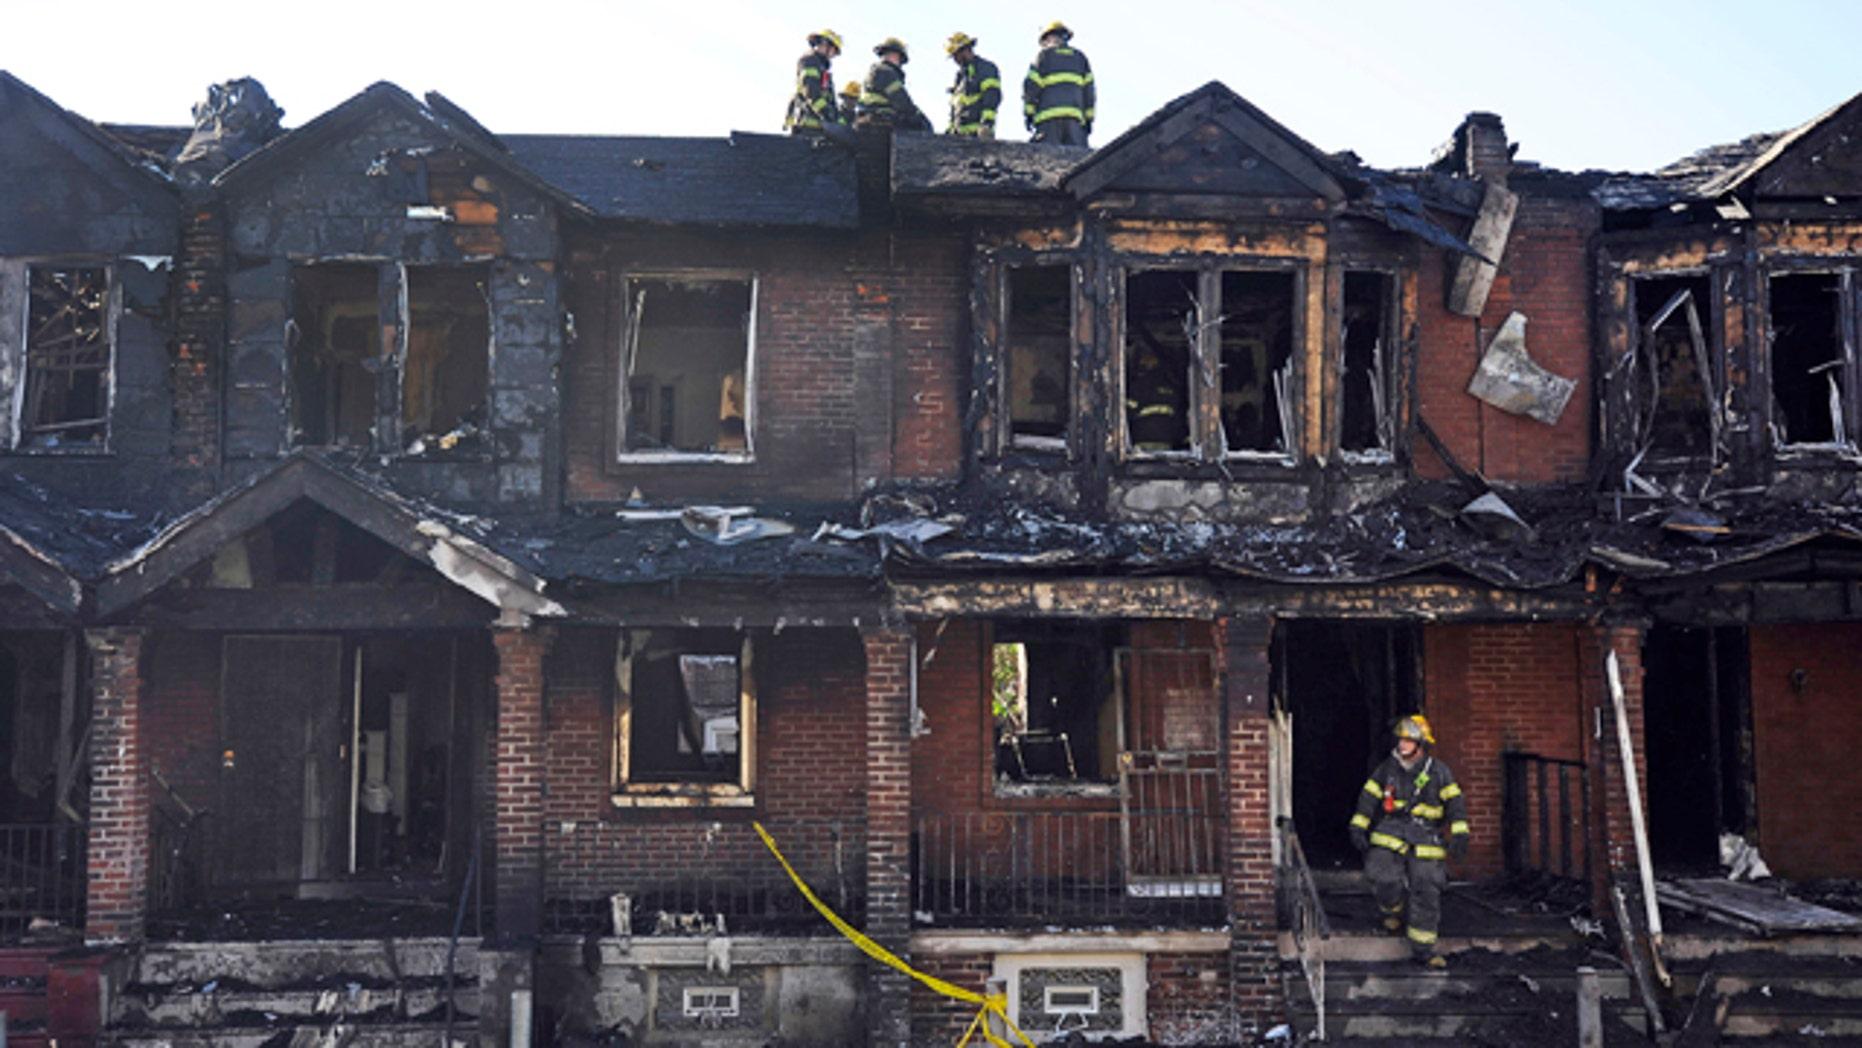 July 5, 2014: Philadelphia firefighters work on burned row homes. (AP Photo/Michael Perez)